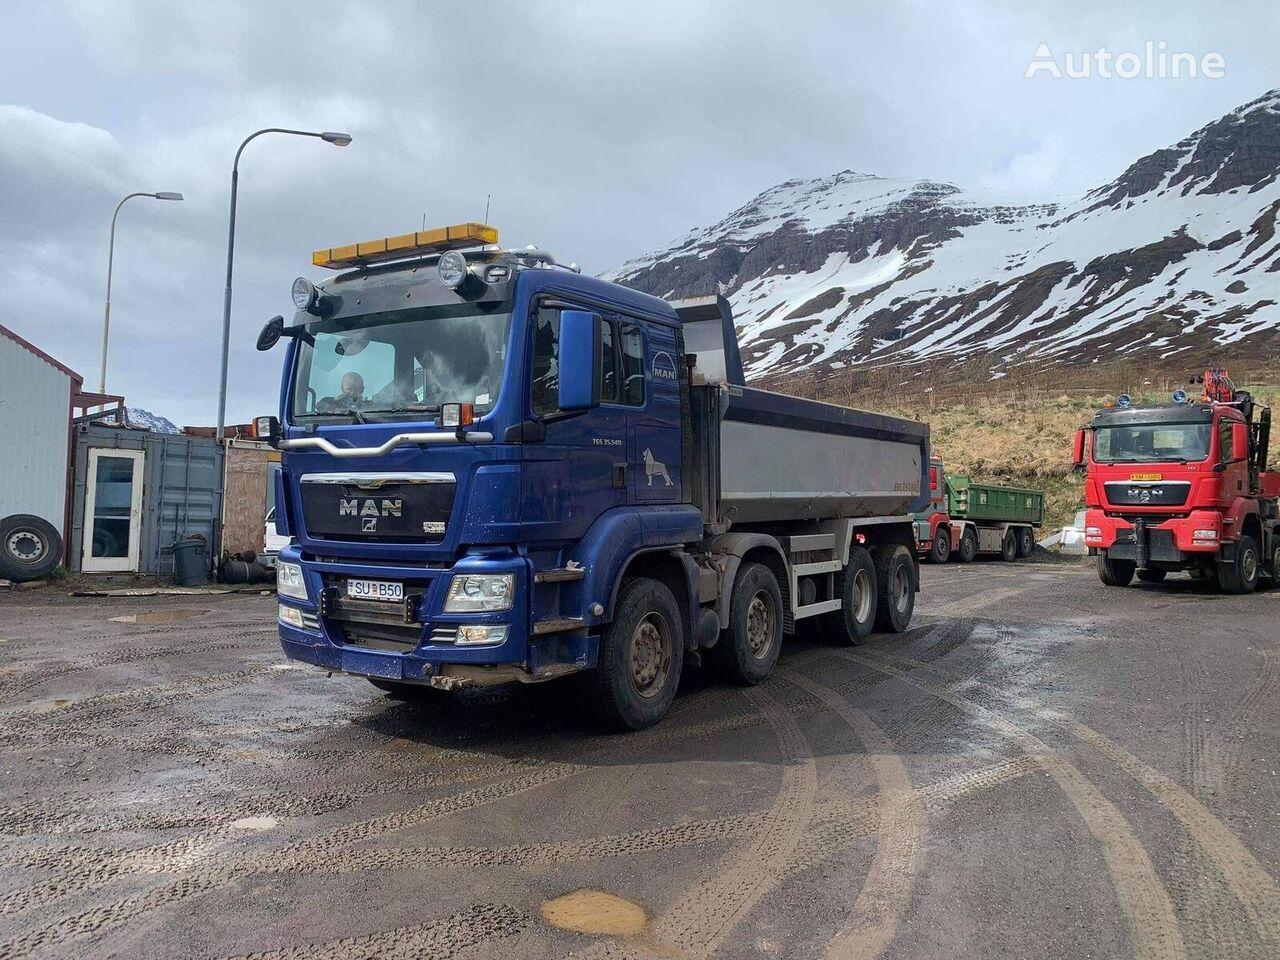 MAN TGS 35.540 dump truck